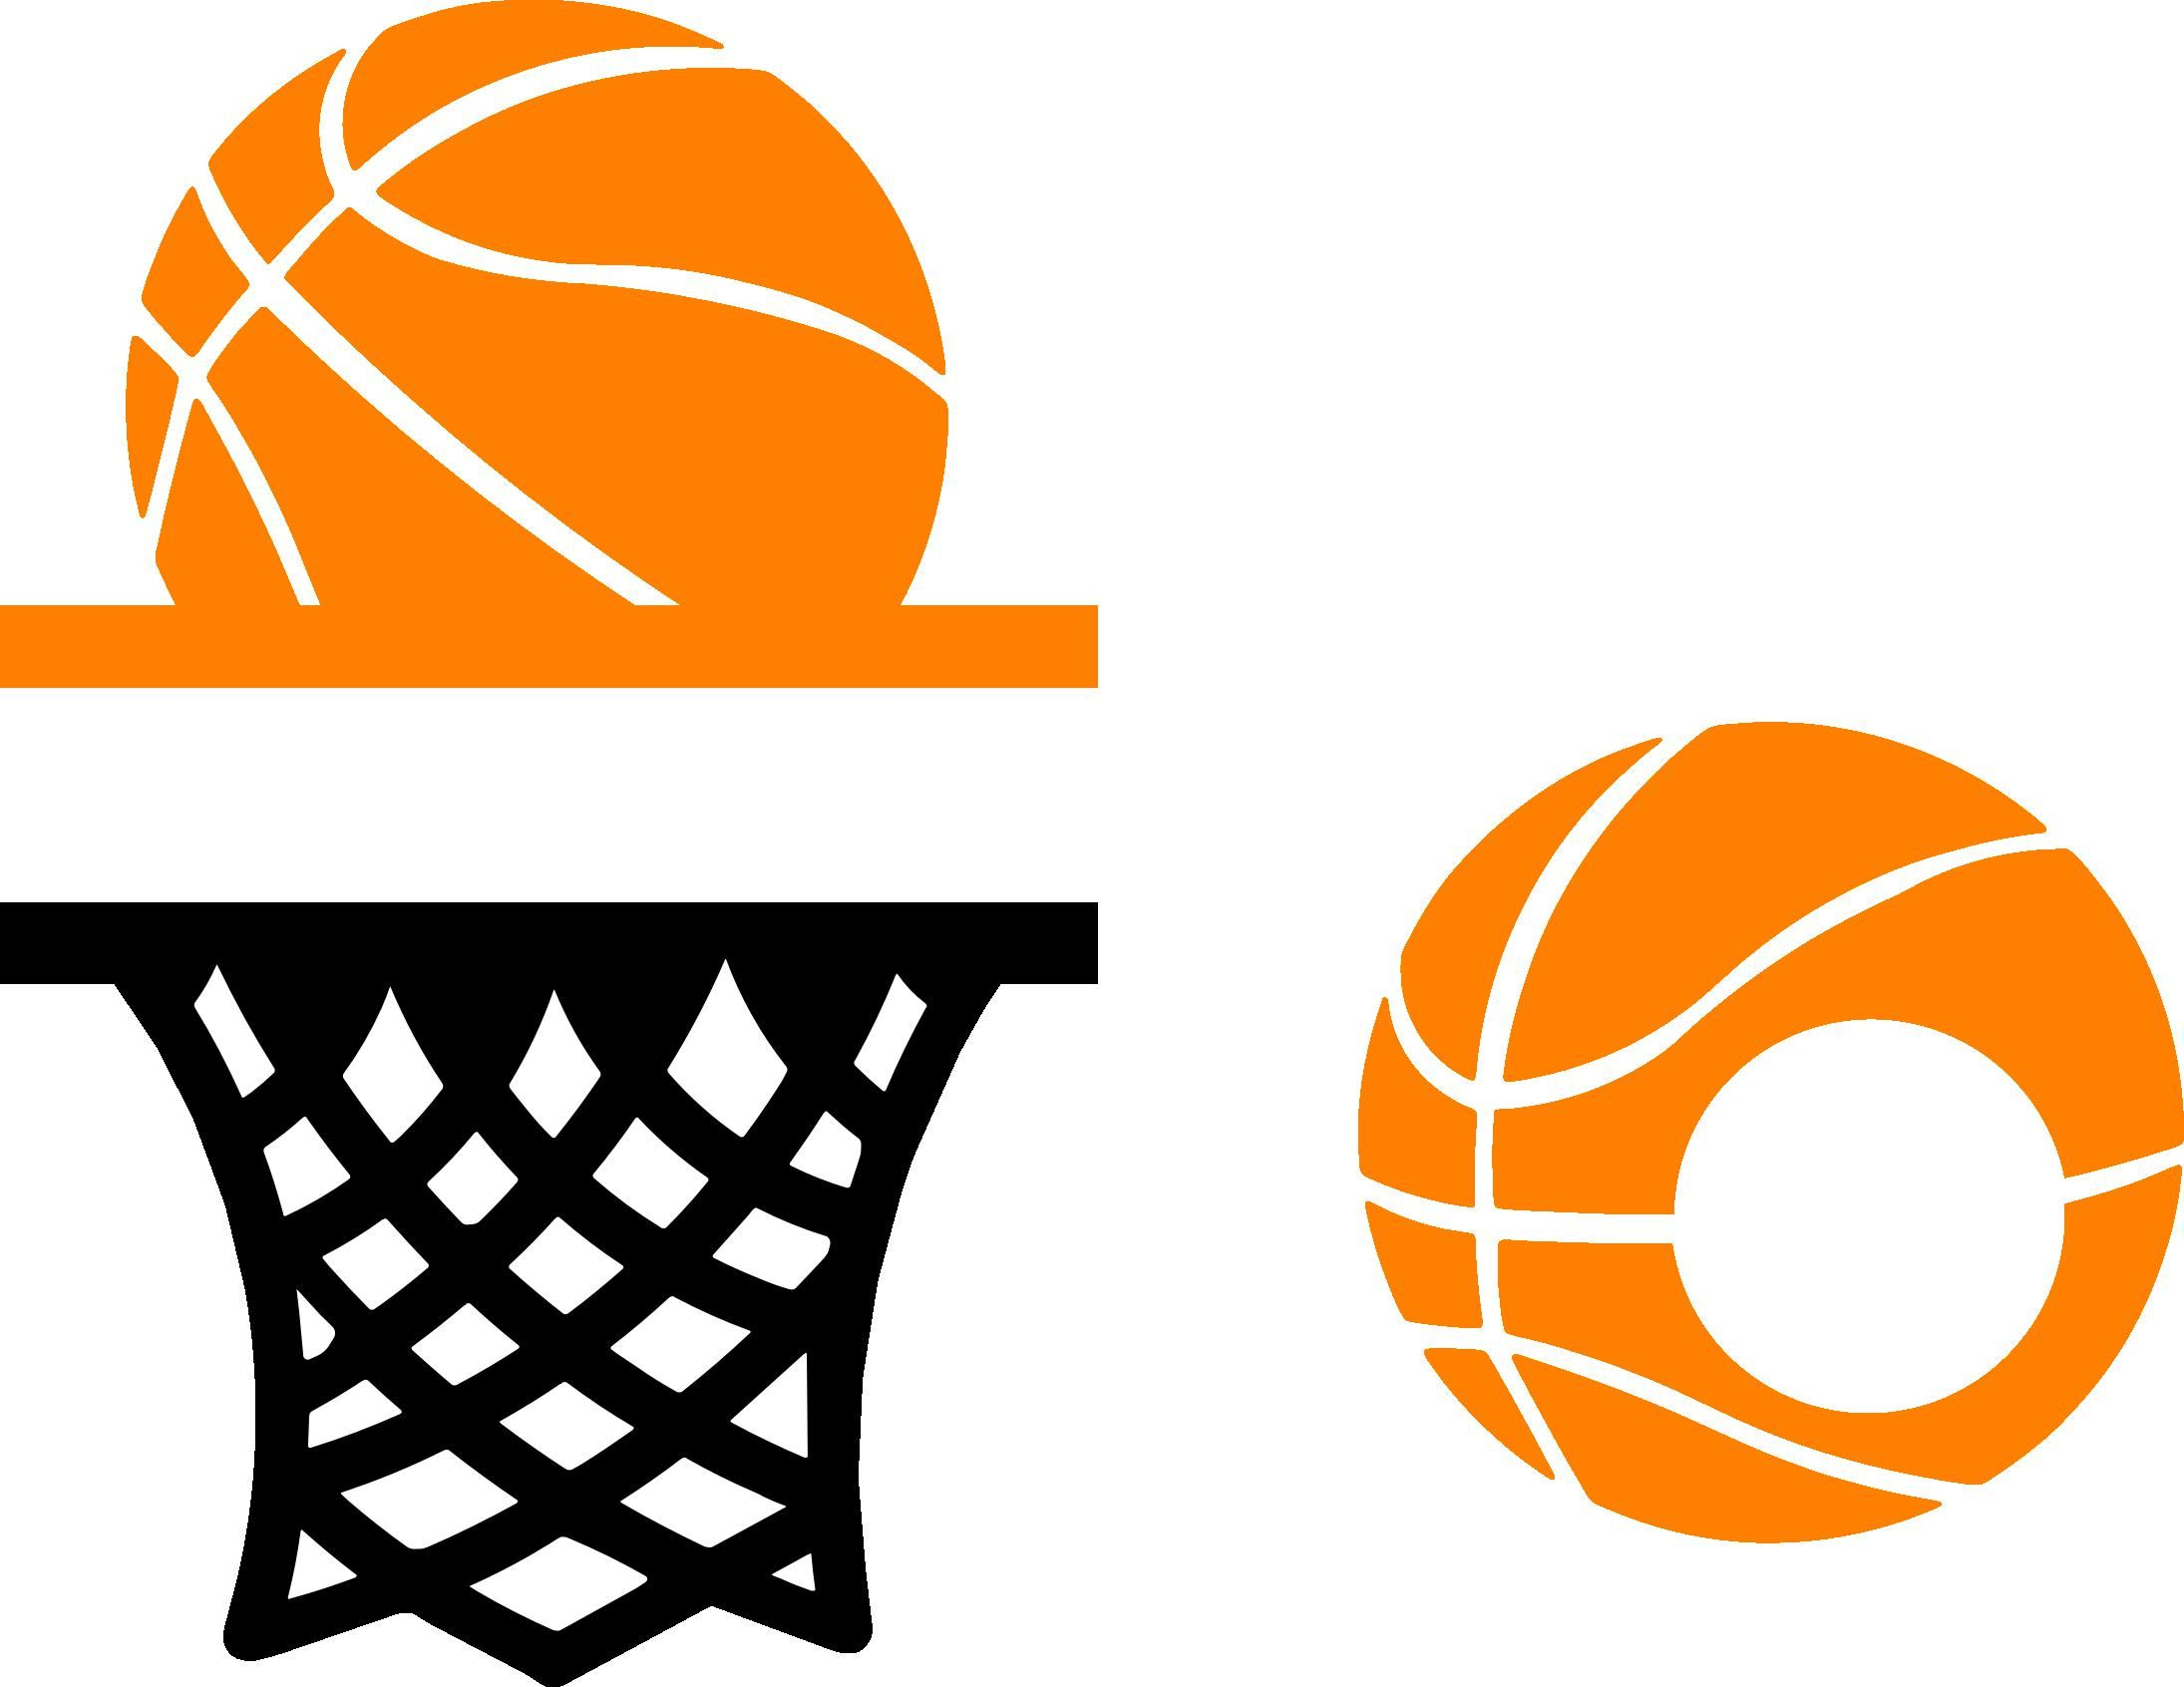 Basketball Monograms Cut Files. Cut these sports monograms